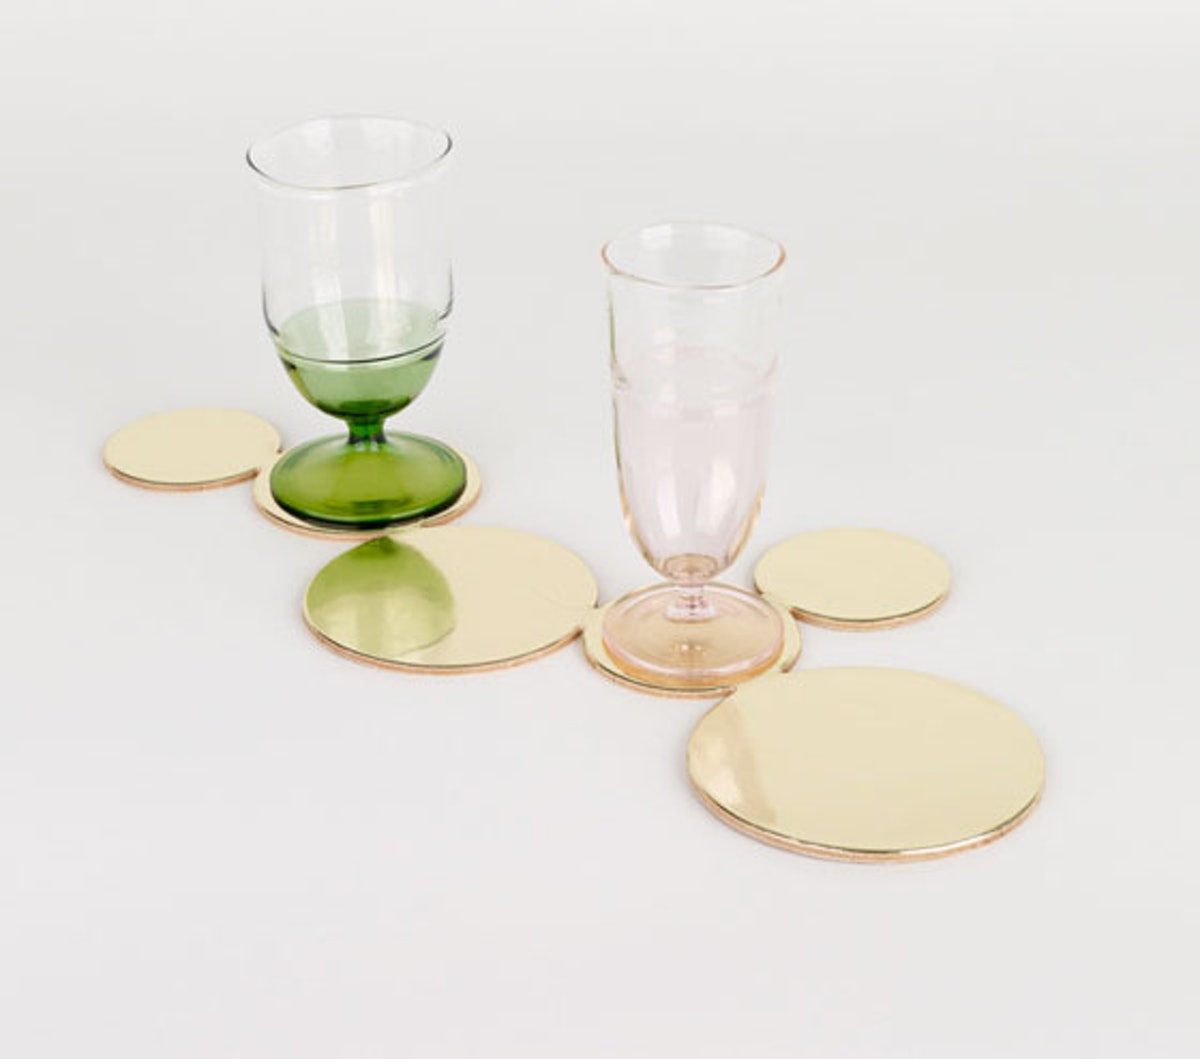 Martino Gamper Coasters